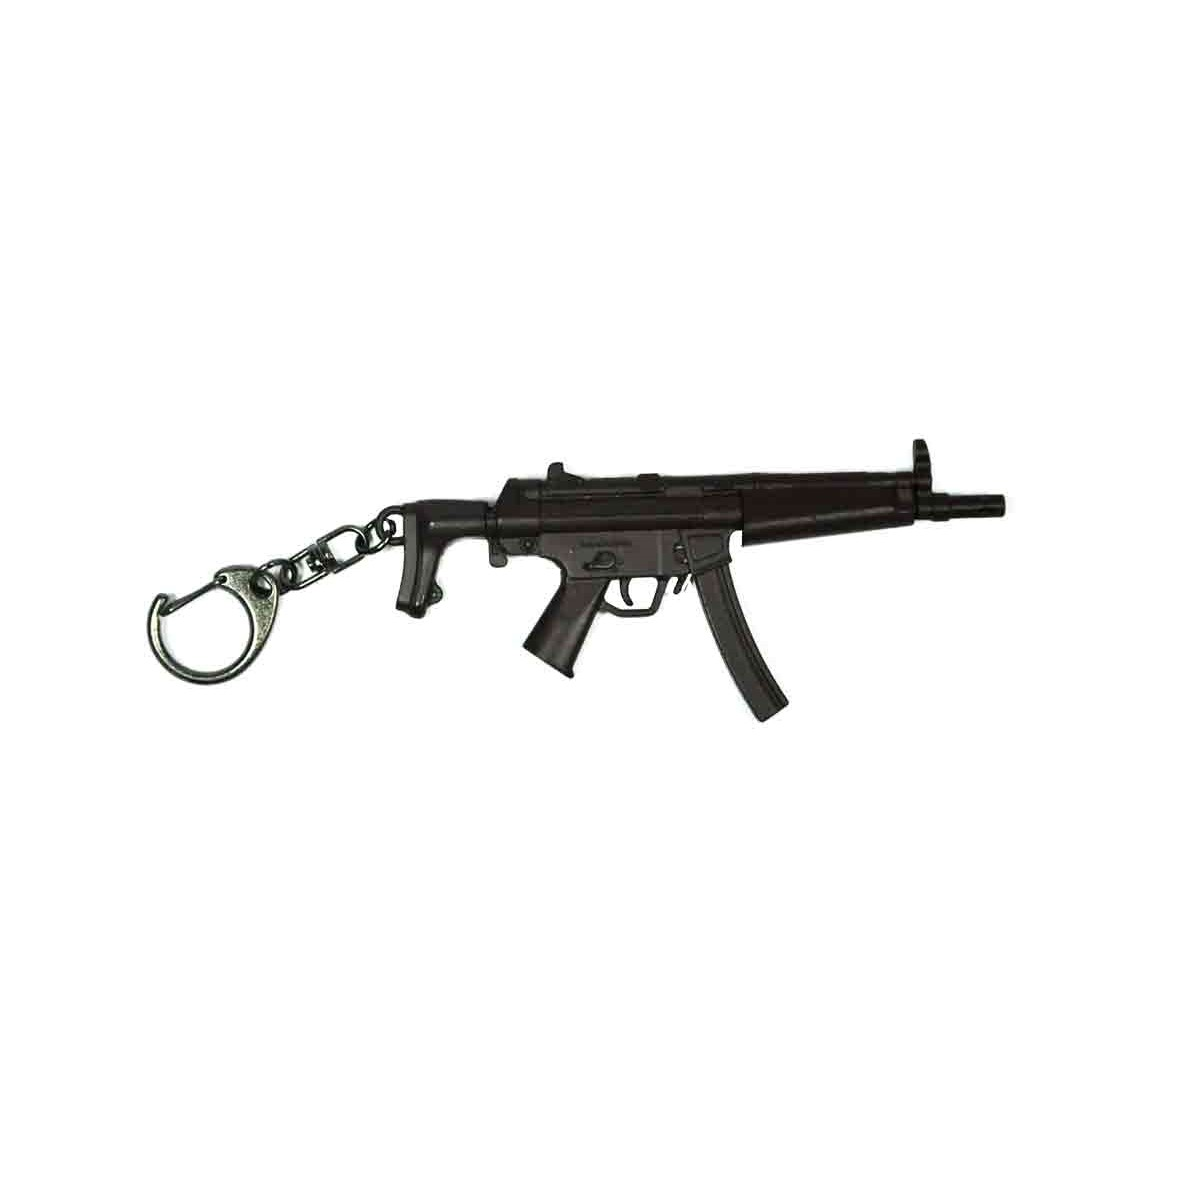 Chaveiro em Metal modelo Rifle MP5 - Arsenal Guns